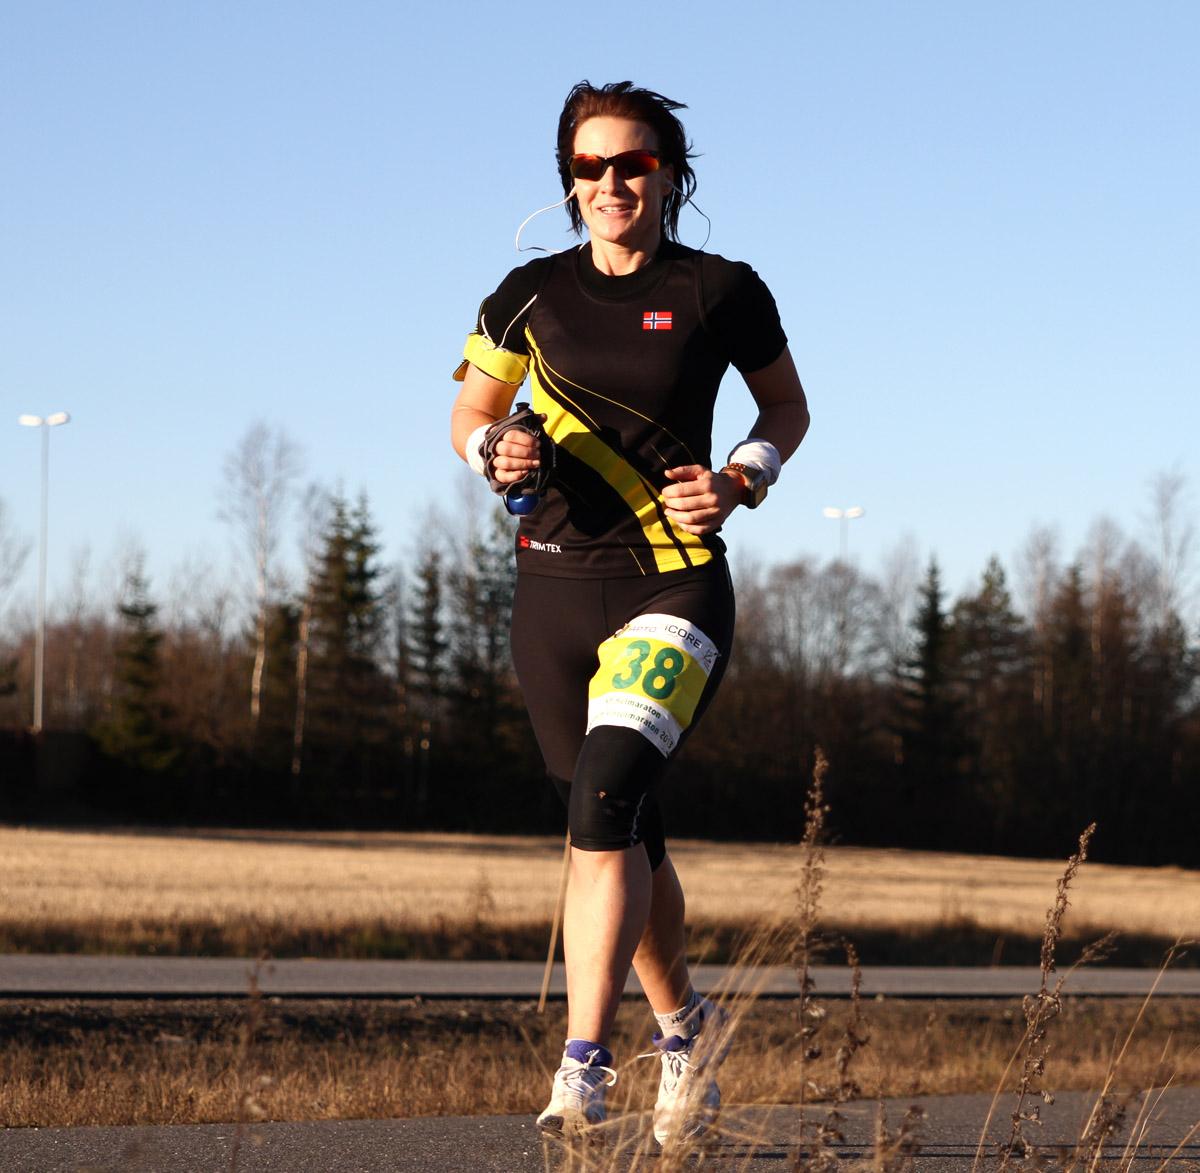 Vintermaraton2013_Hilde-Johansen_16km.jpg